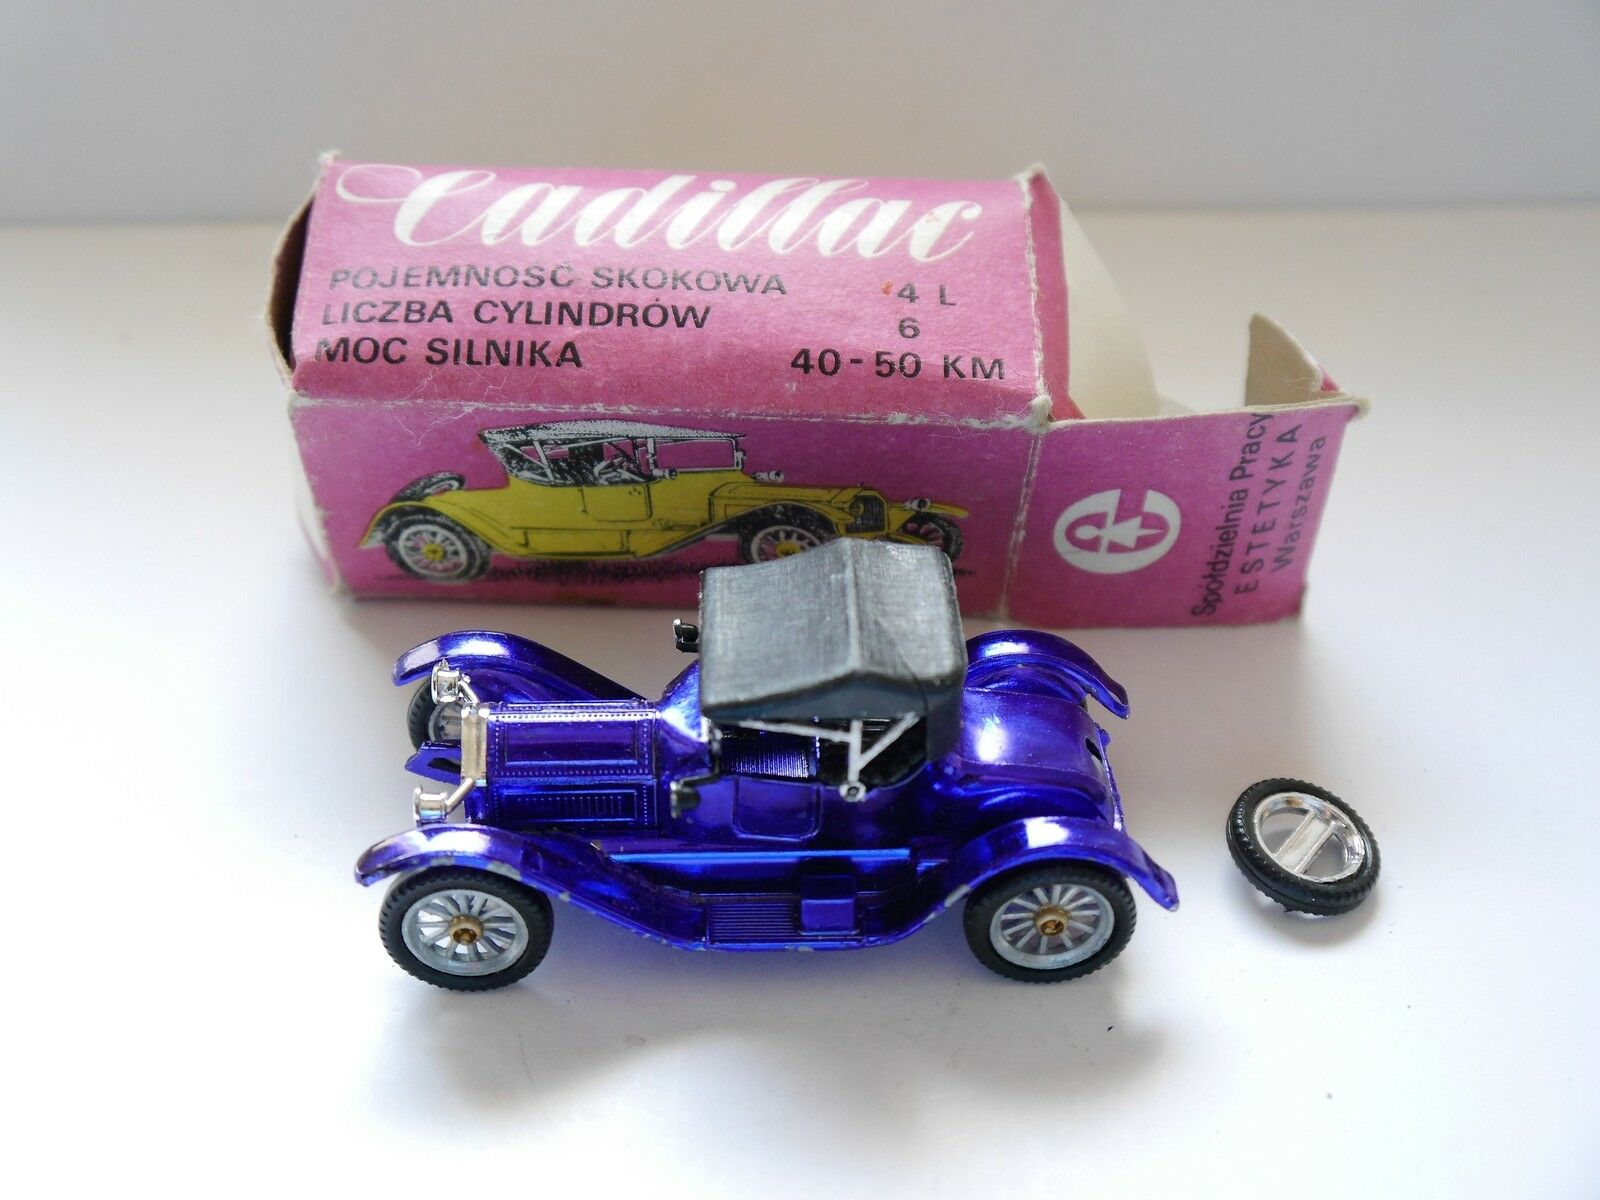 Cadillac 1913 in Bleu Bleu Blue, NOVOEXPORT RADON URSS USSR USSR USSR CCCP dans 1:43 en boîte! c9dc8e